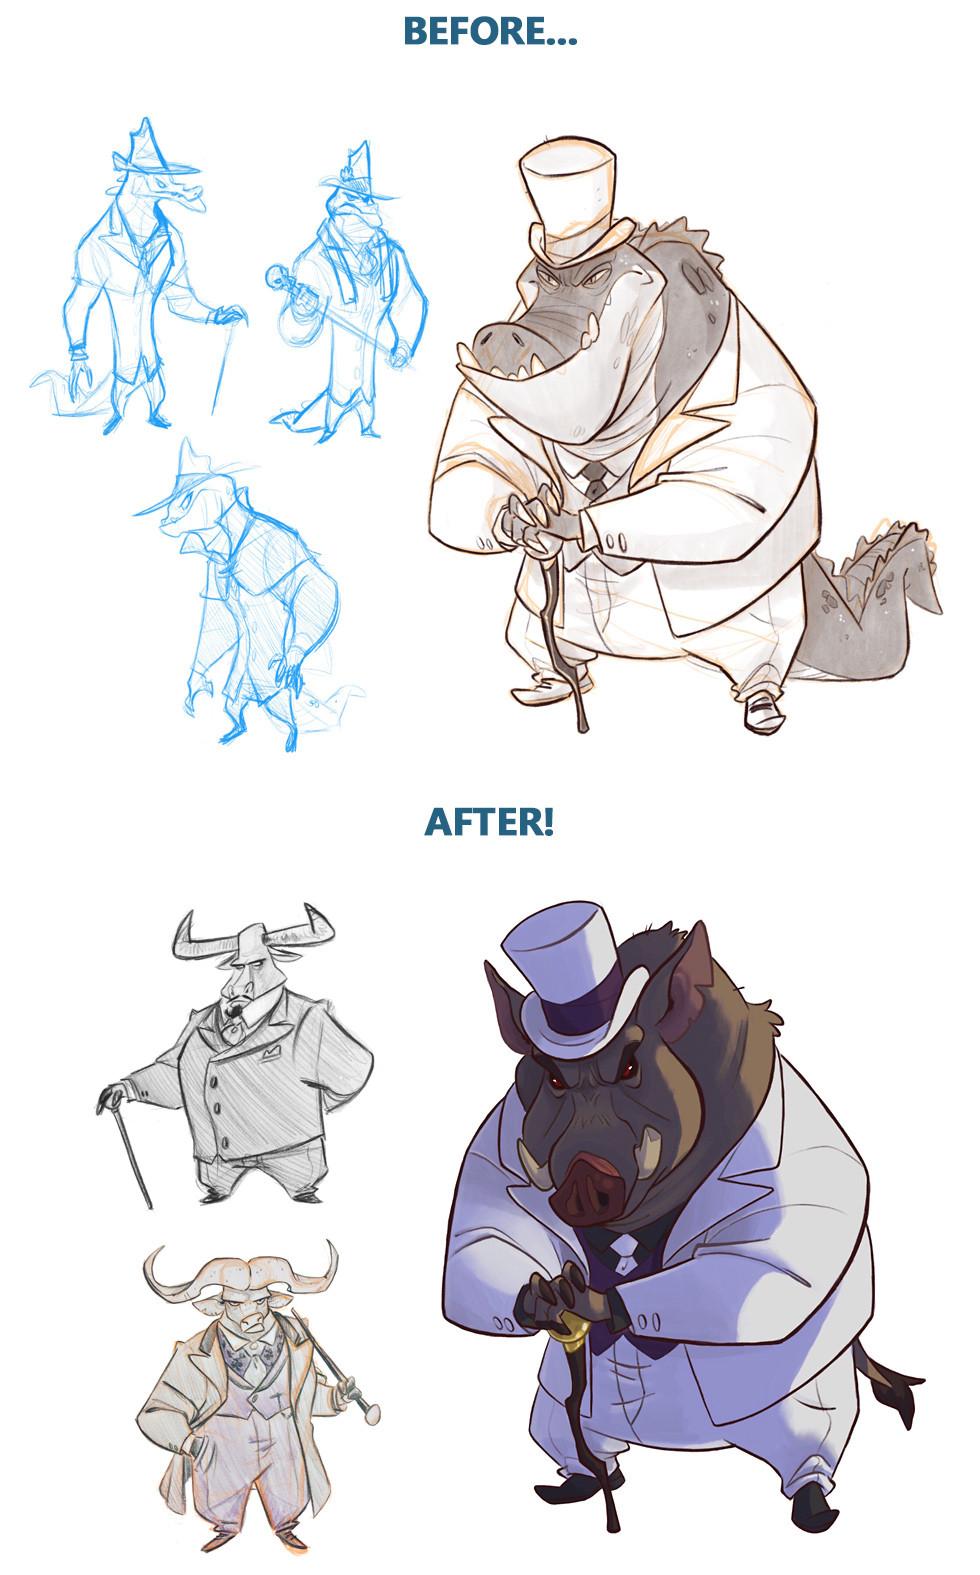 professor_moriarty_character_design.jpg